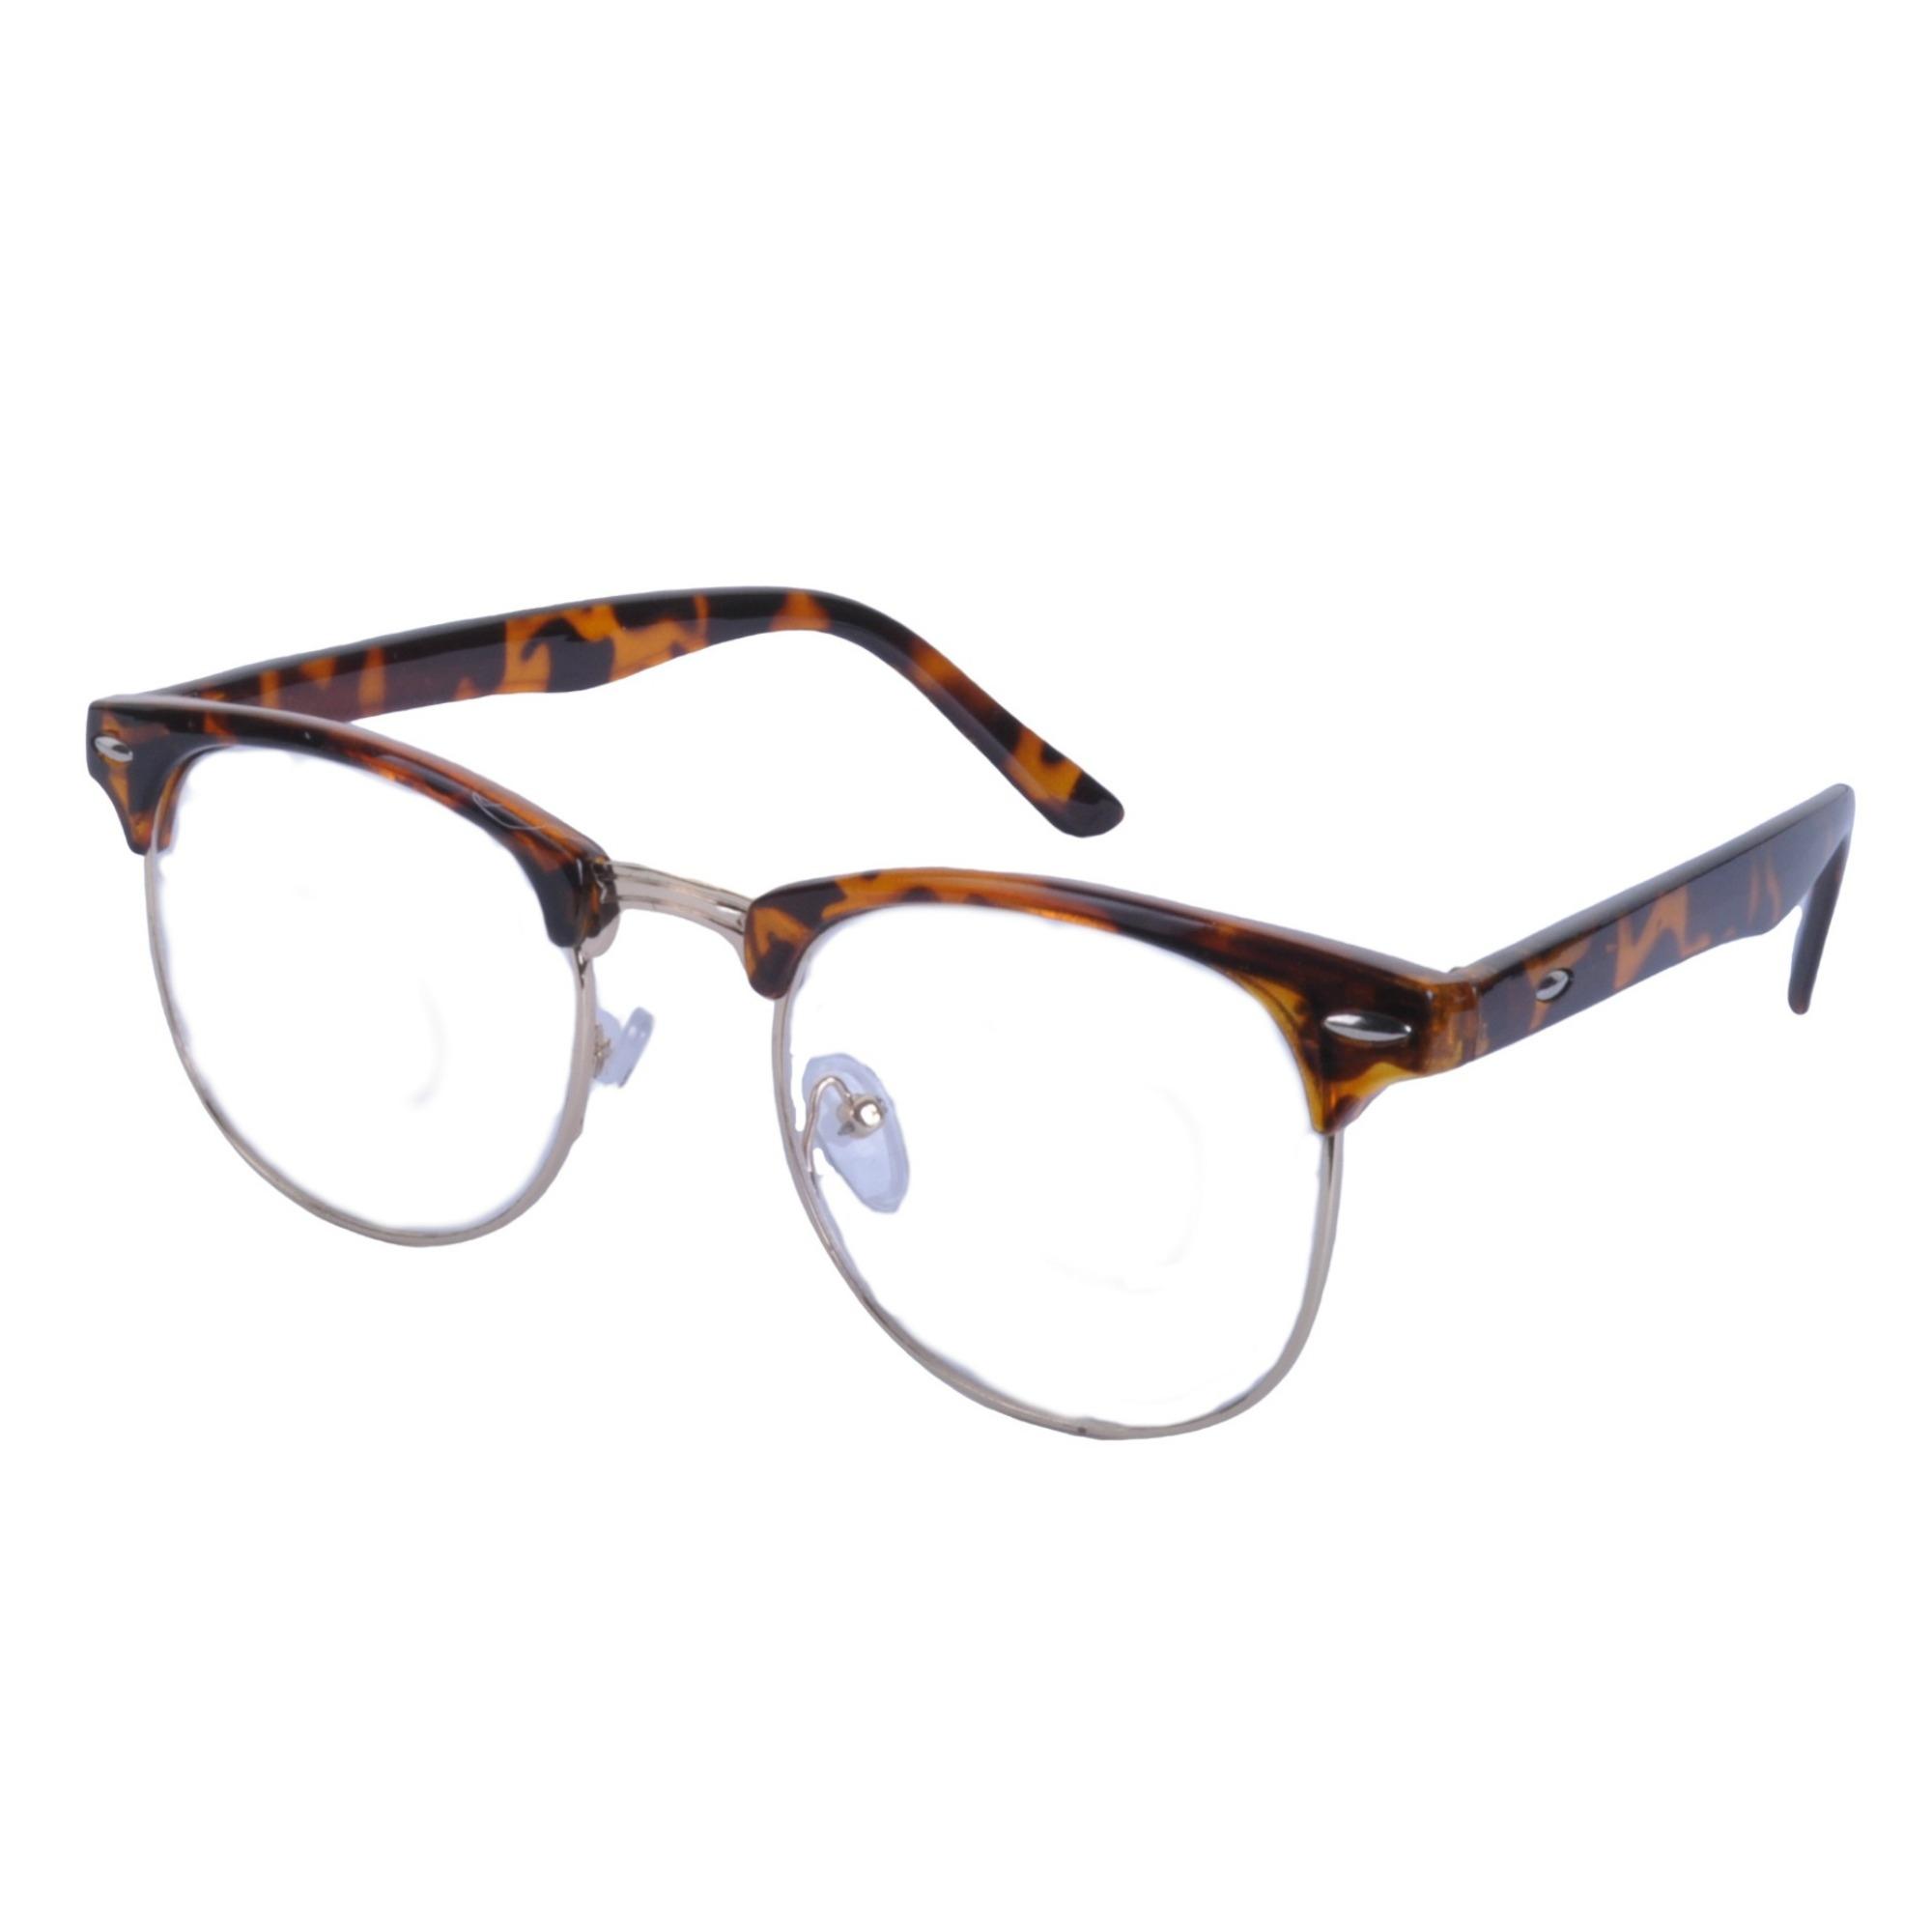 Vintage-Lente-Transparente-Cejas-Barra-Gafas-Gafas-de-Sol-Hron-Borde-Negro miniatura 13